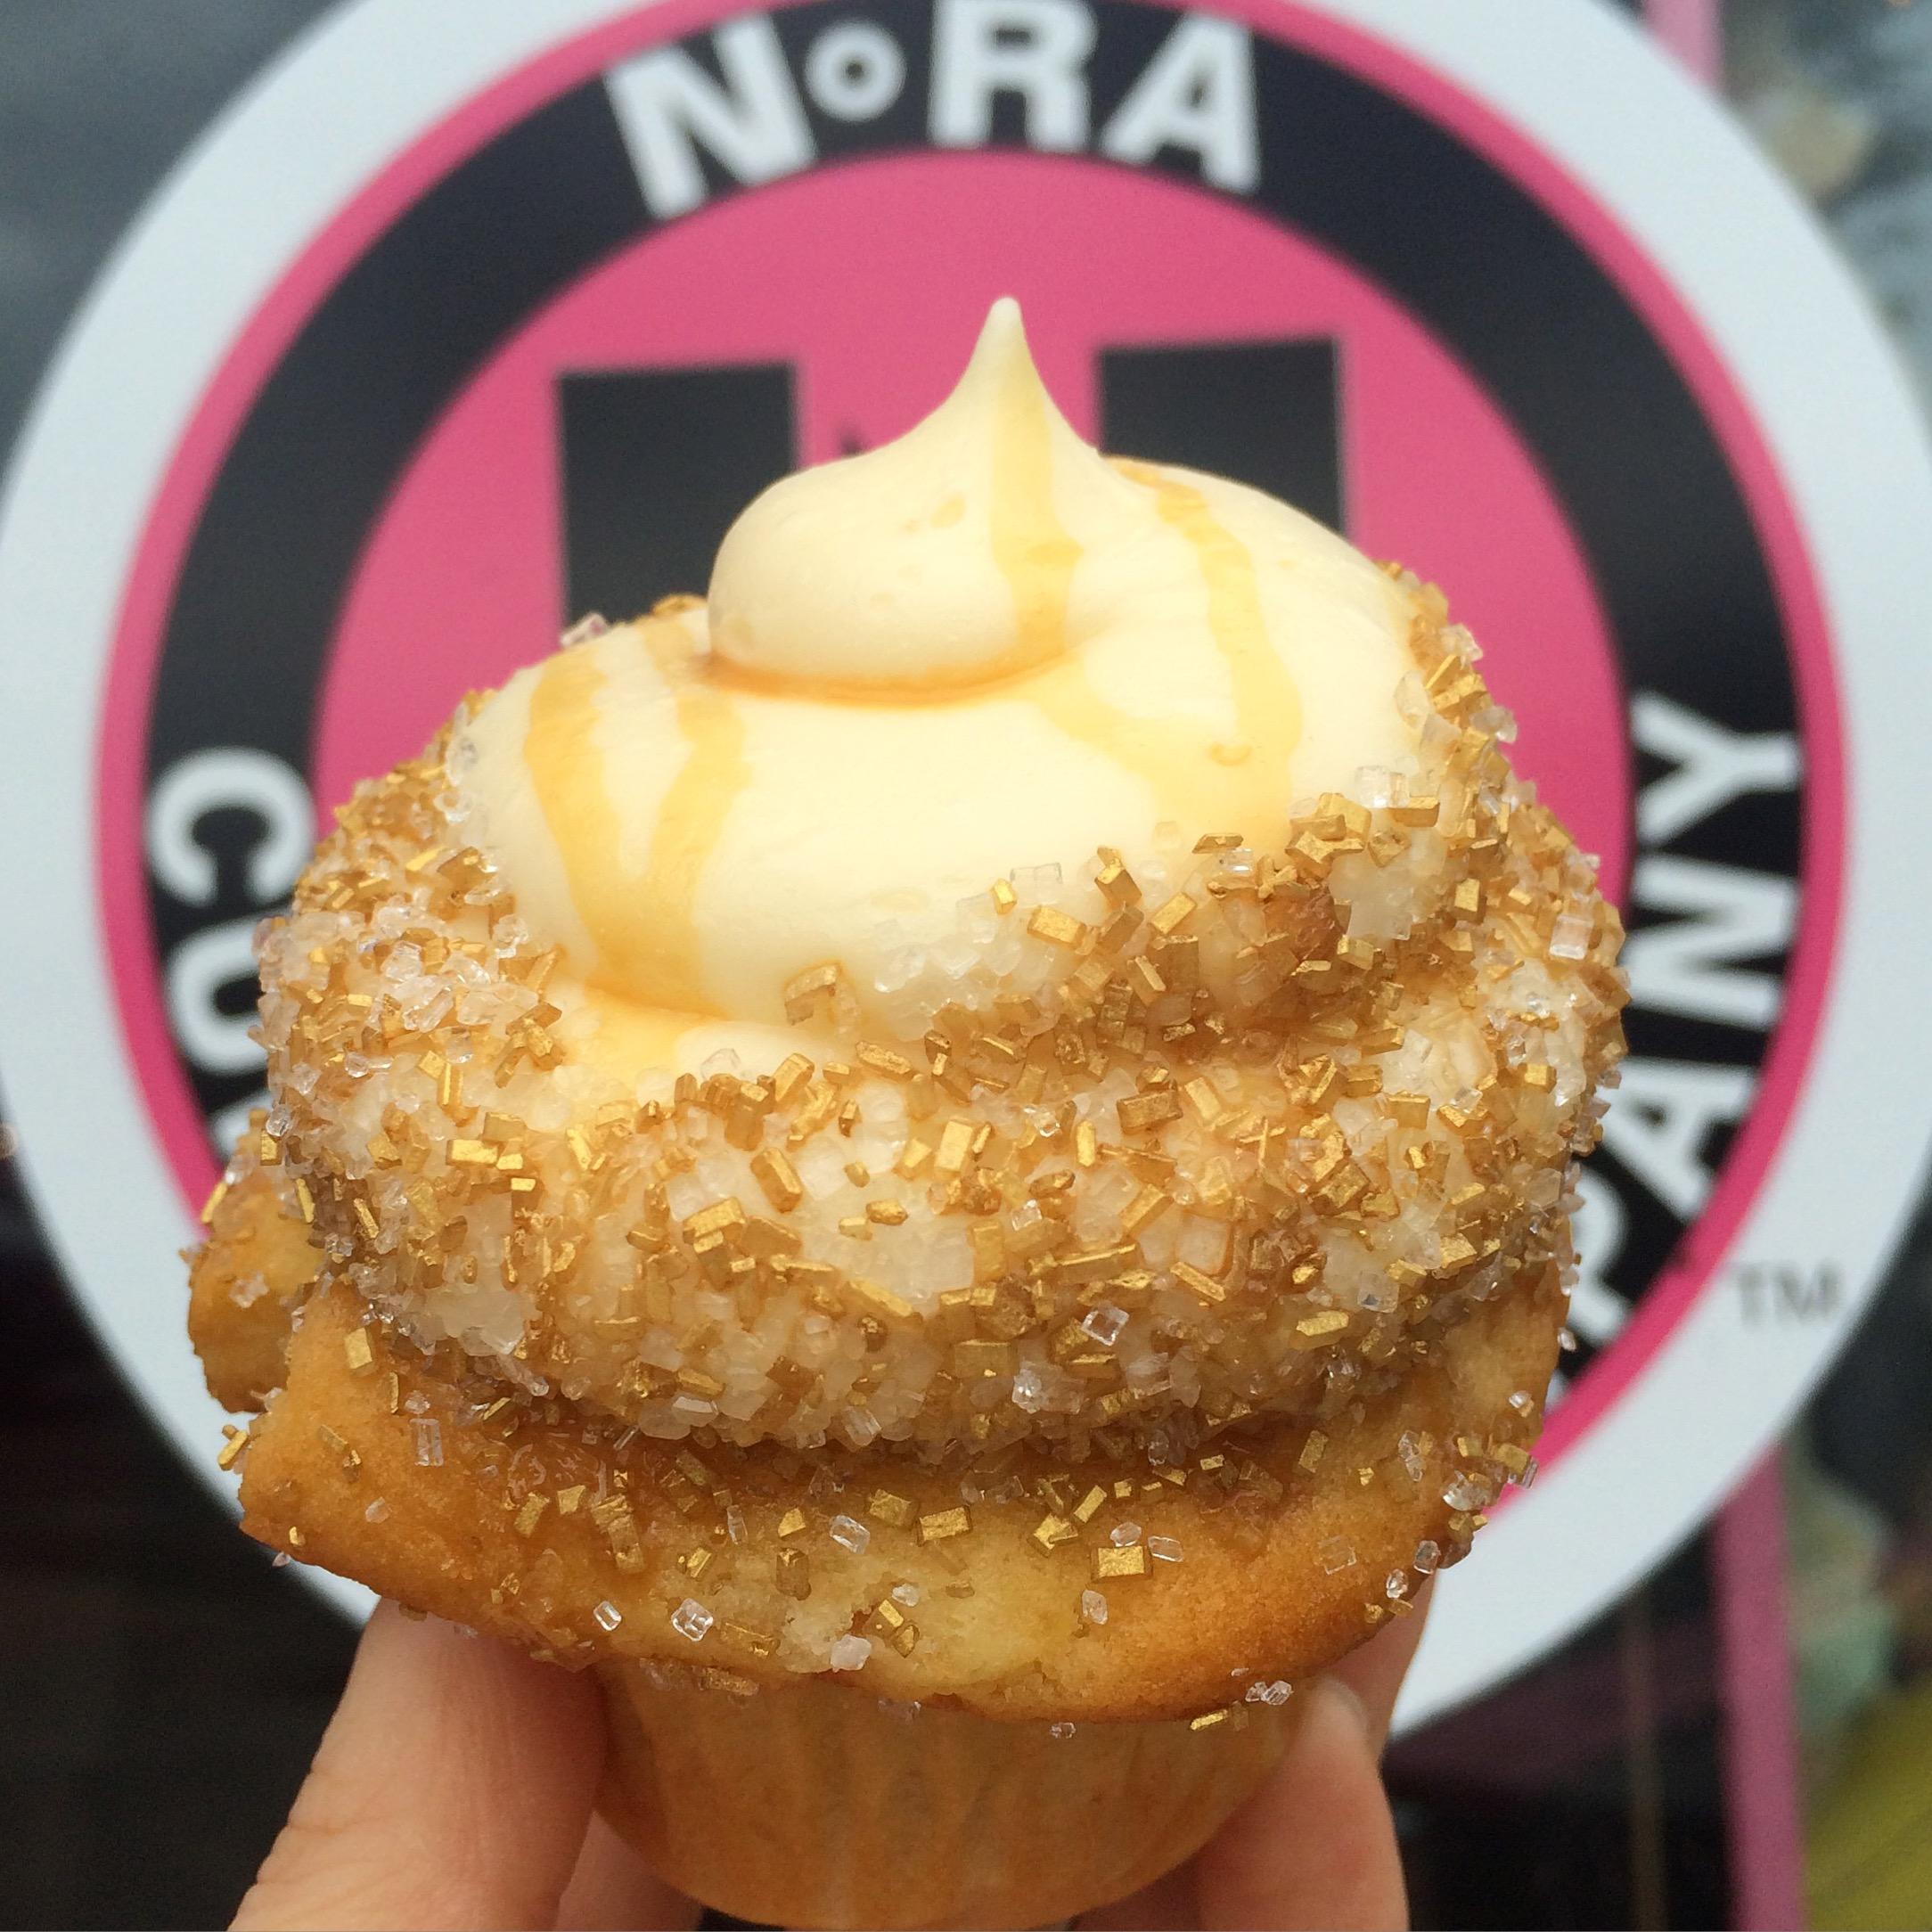 CT Eats Out Nora Cupcake